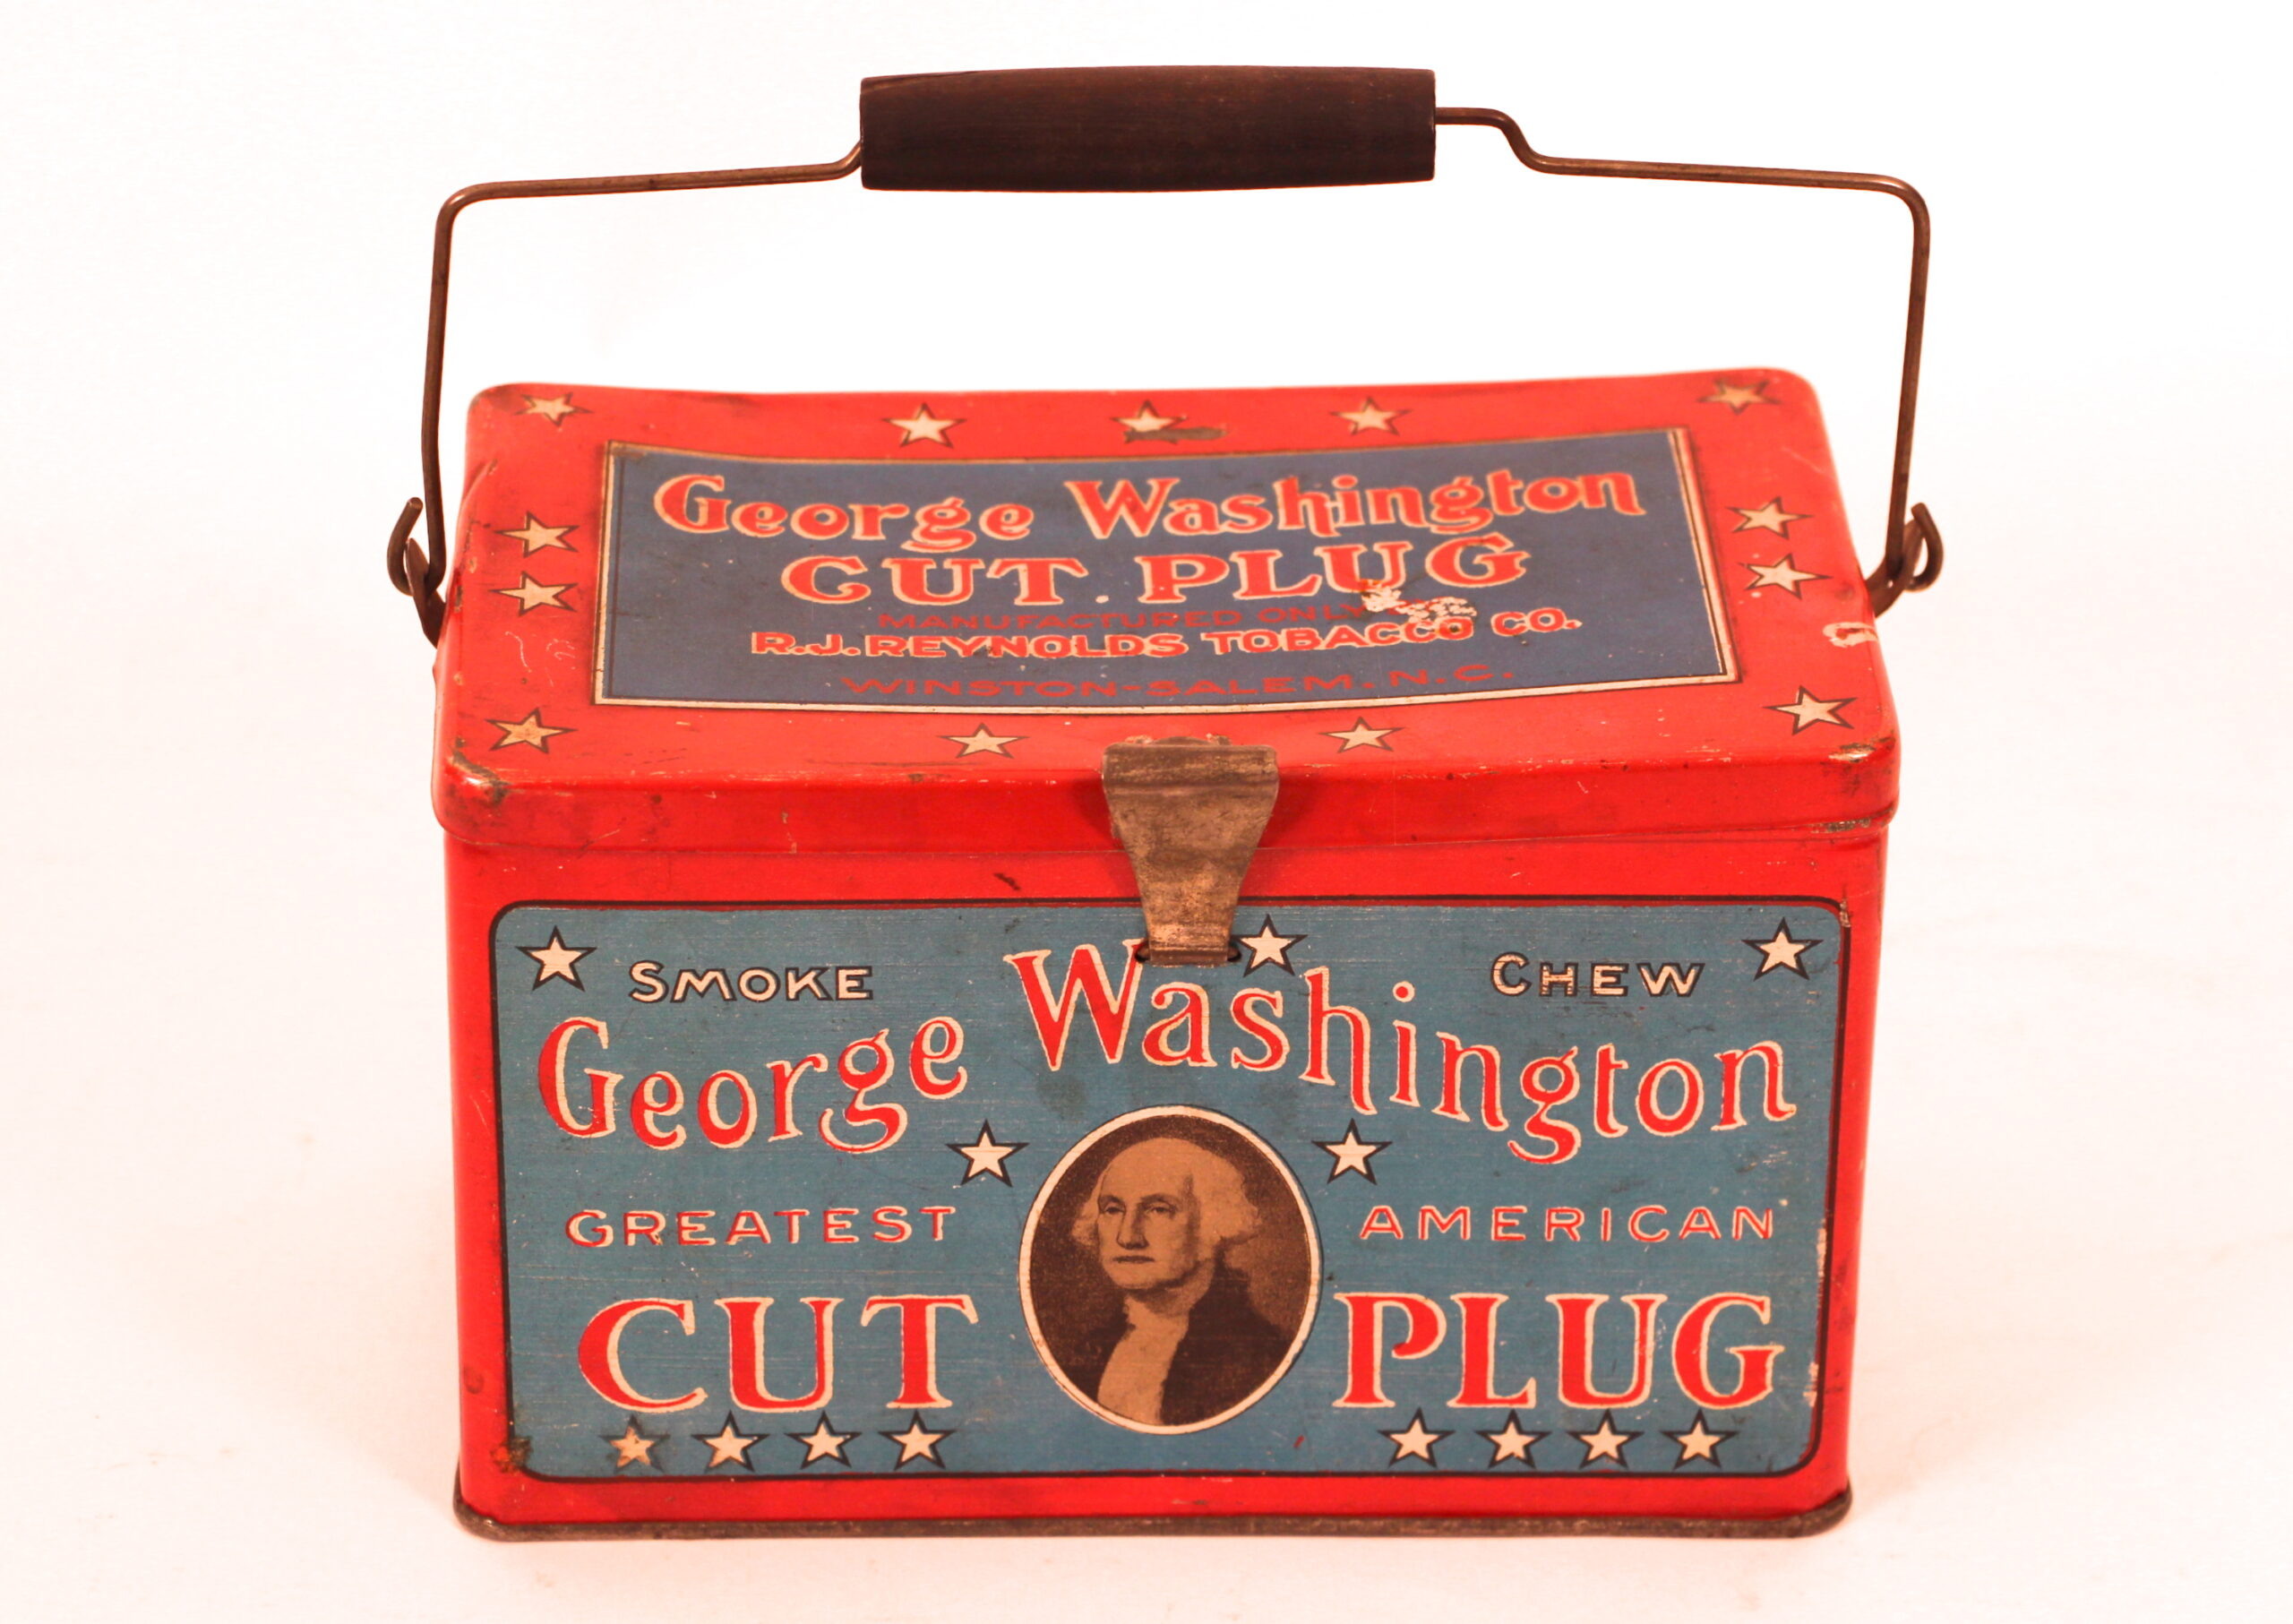 George Washington Cut Plug Lunch Box Tobacco Tin. Circa 1910